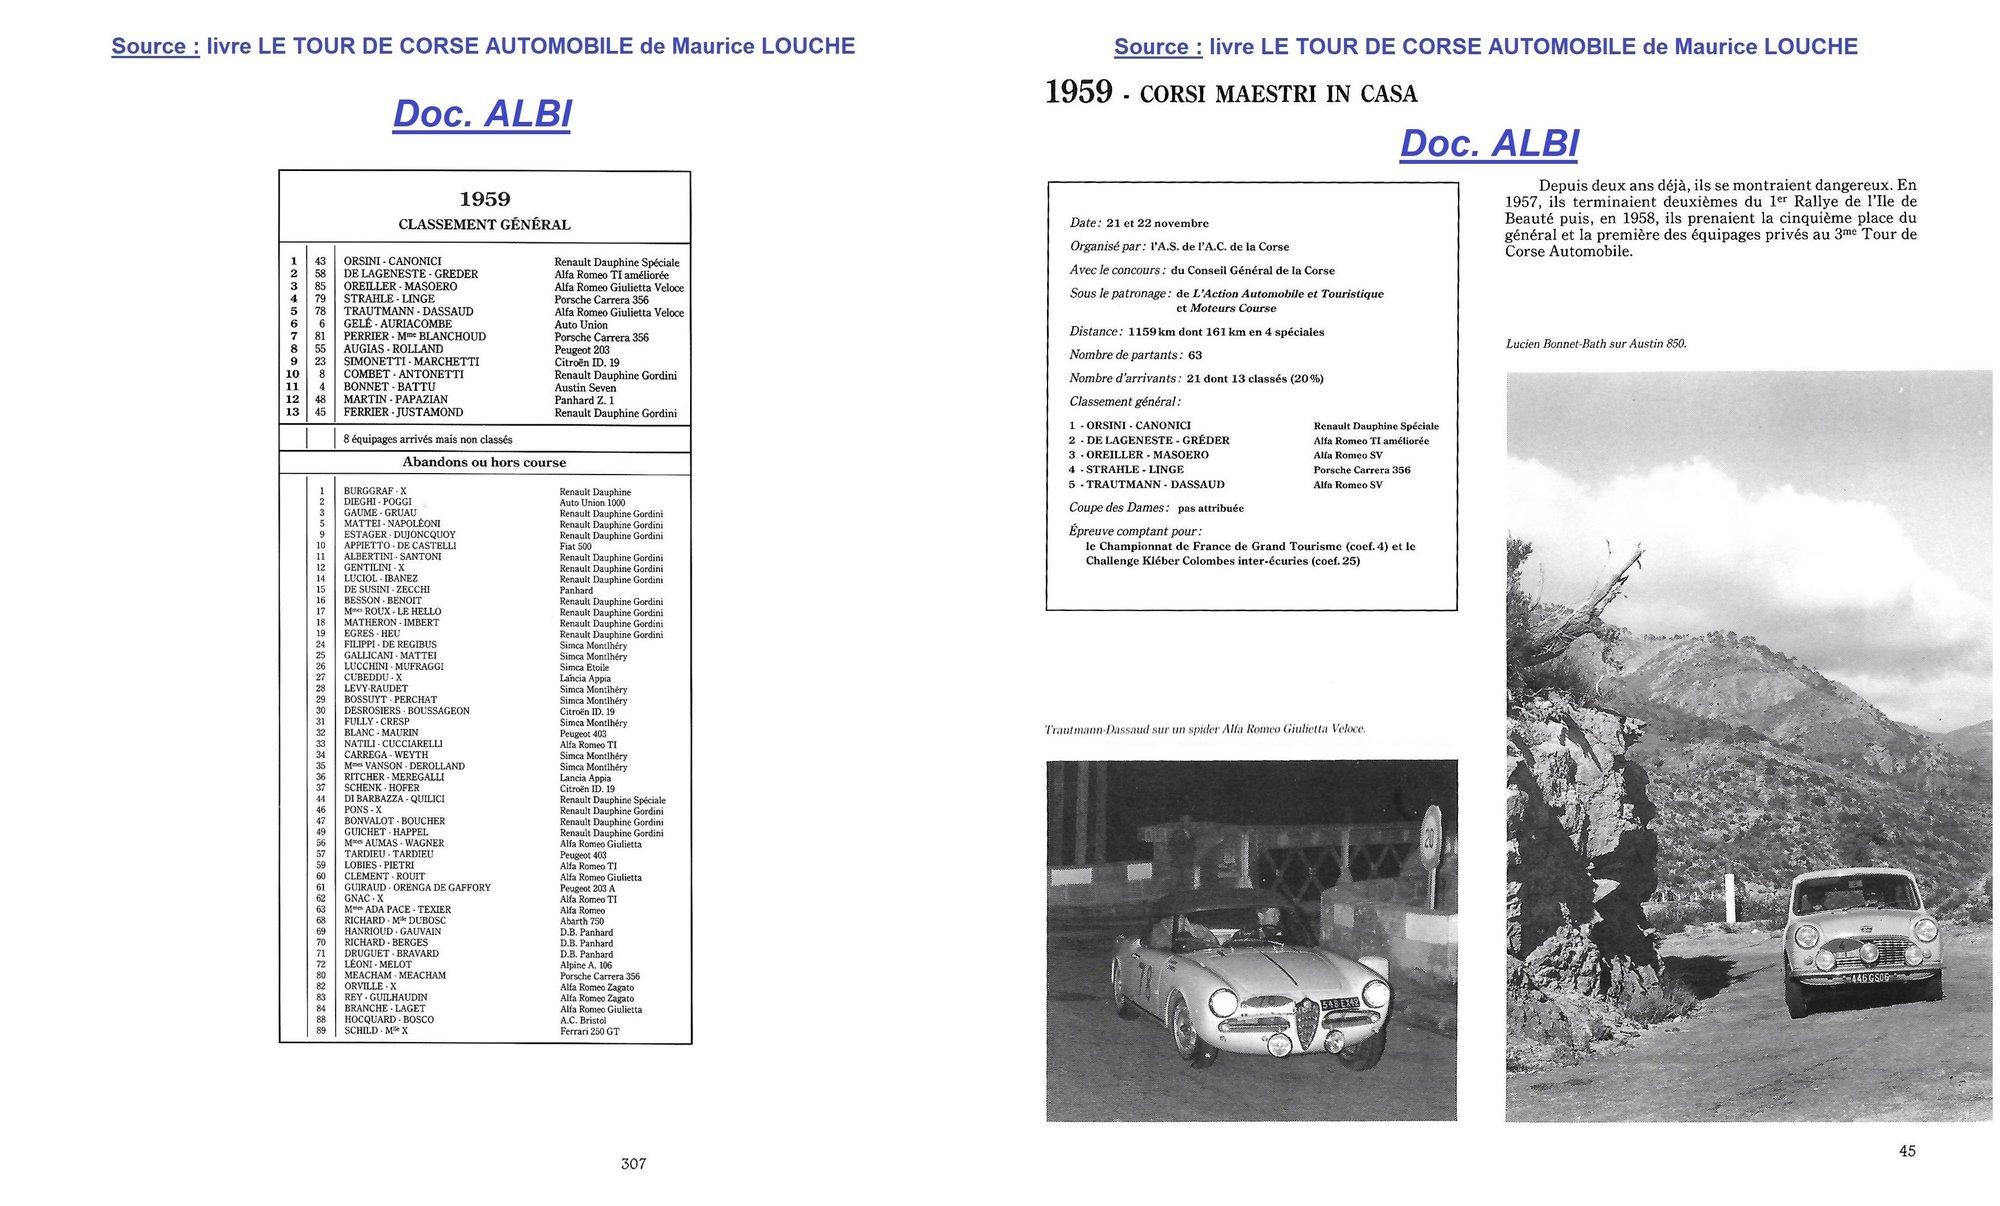 1959-Tour-Corse-M-Louche-00-01-a.thumb.jpg.1a5b9ddd6c3a18db39f3396127c96b1b.jpg